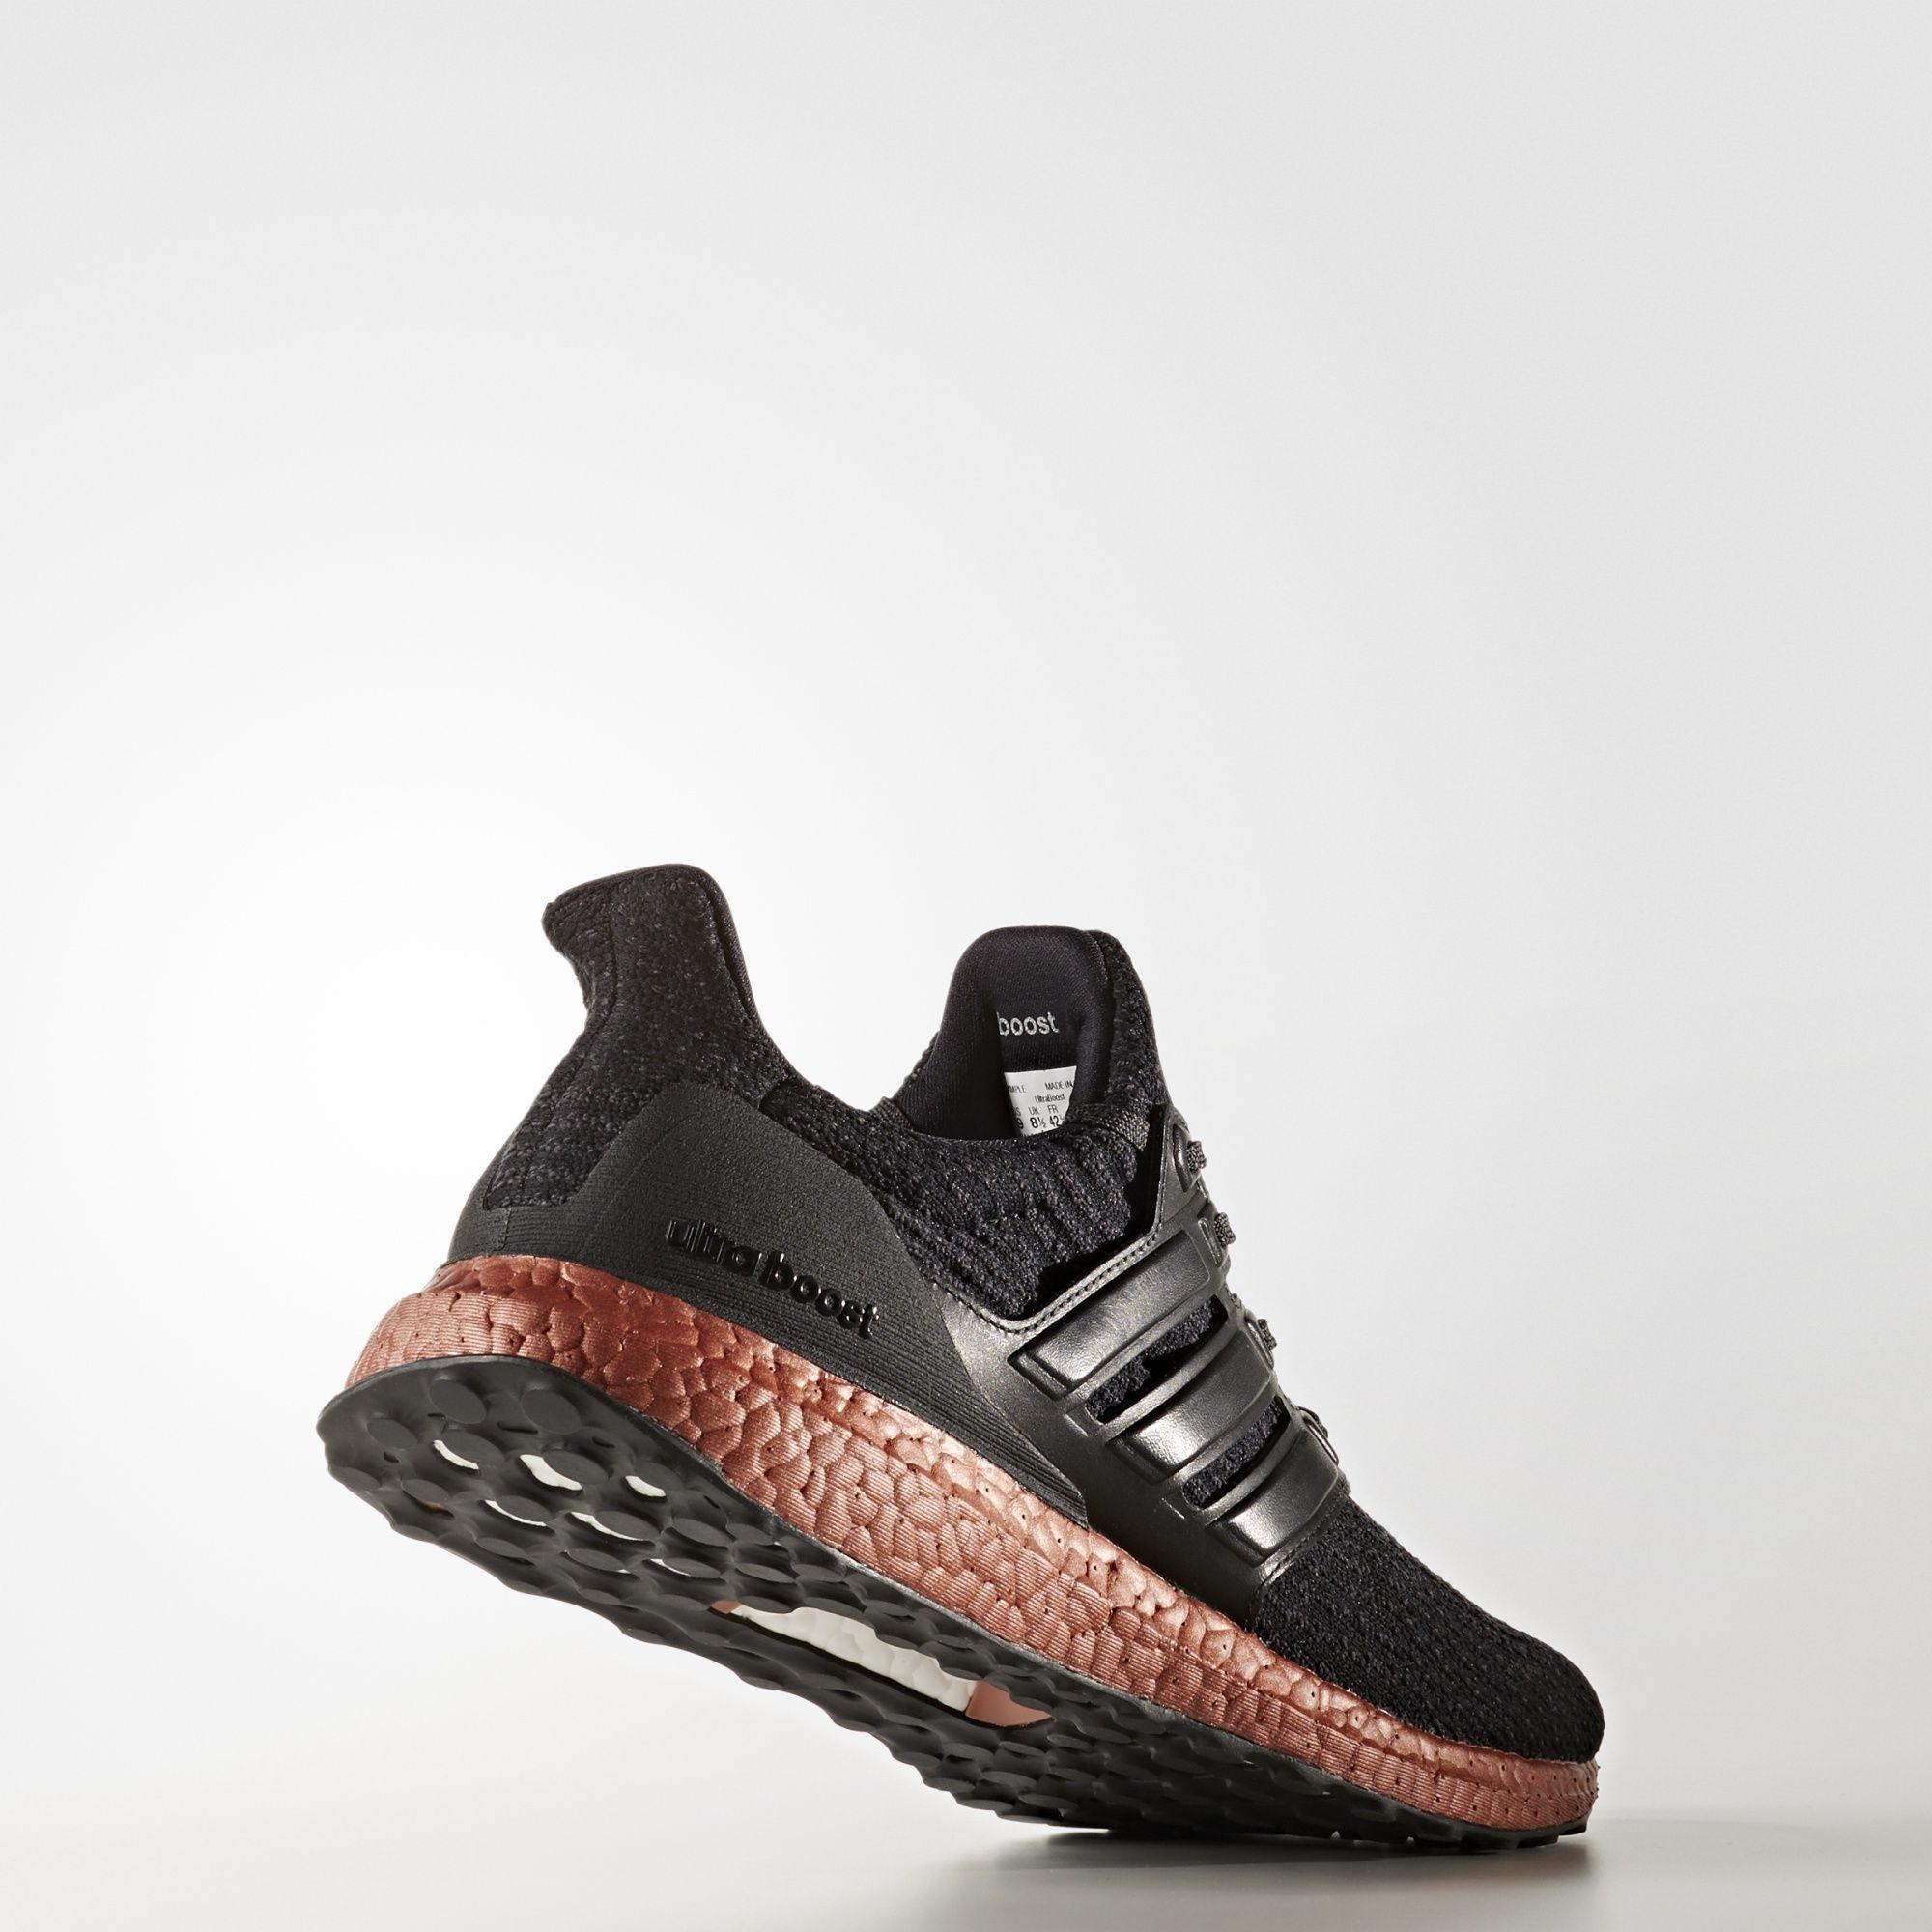 adidas Ultra Boost 3 Tech Rust CG4086 3